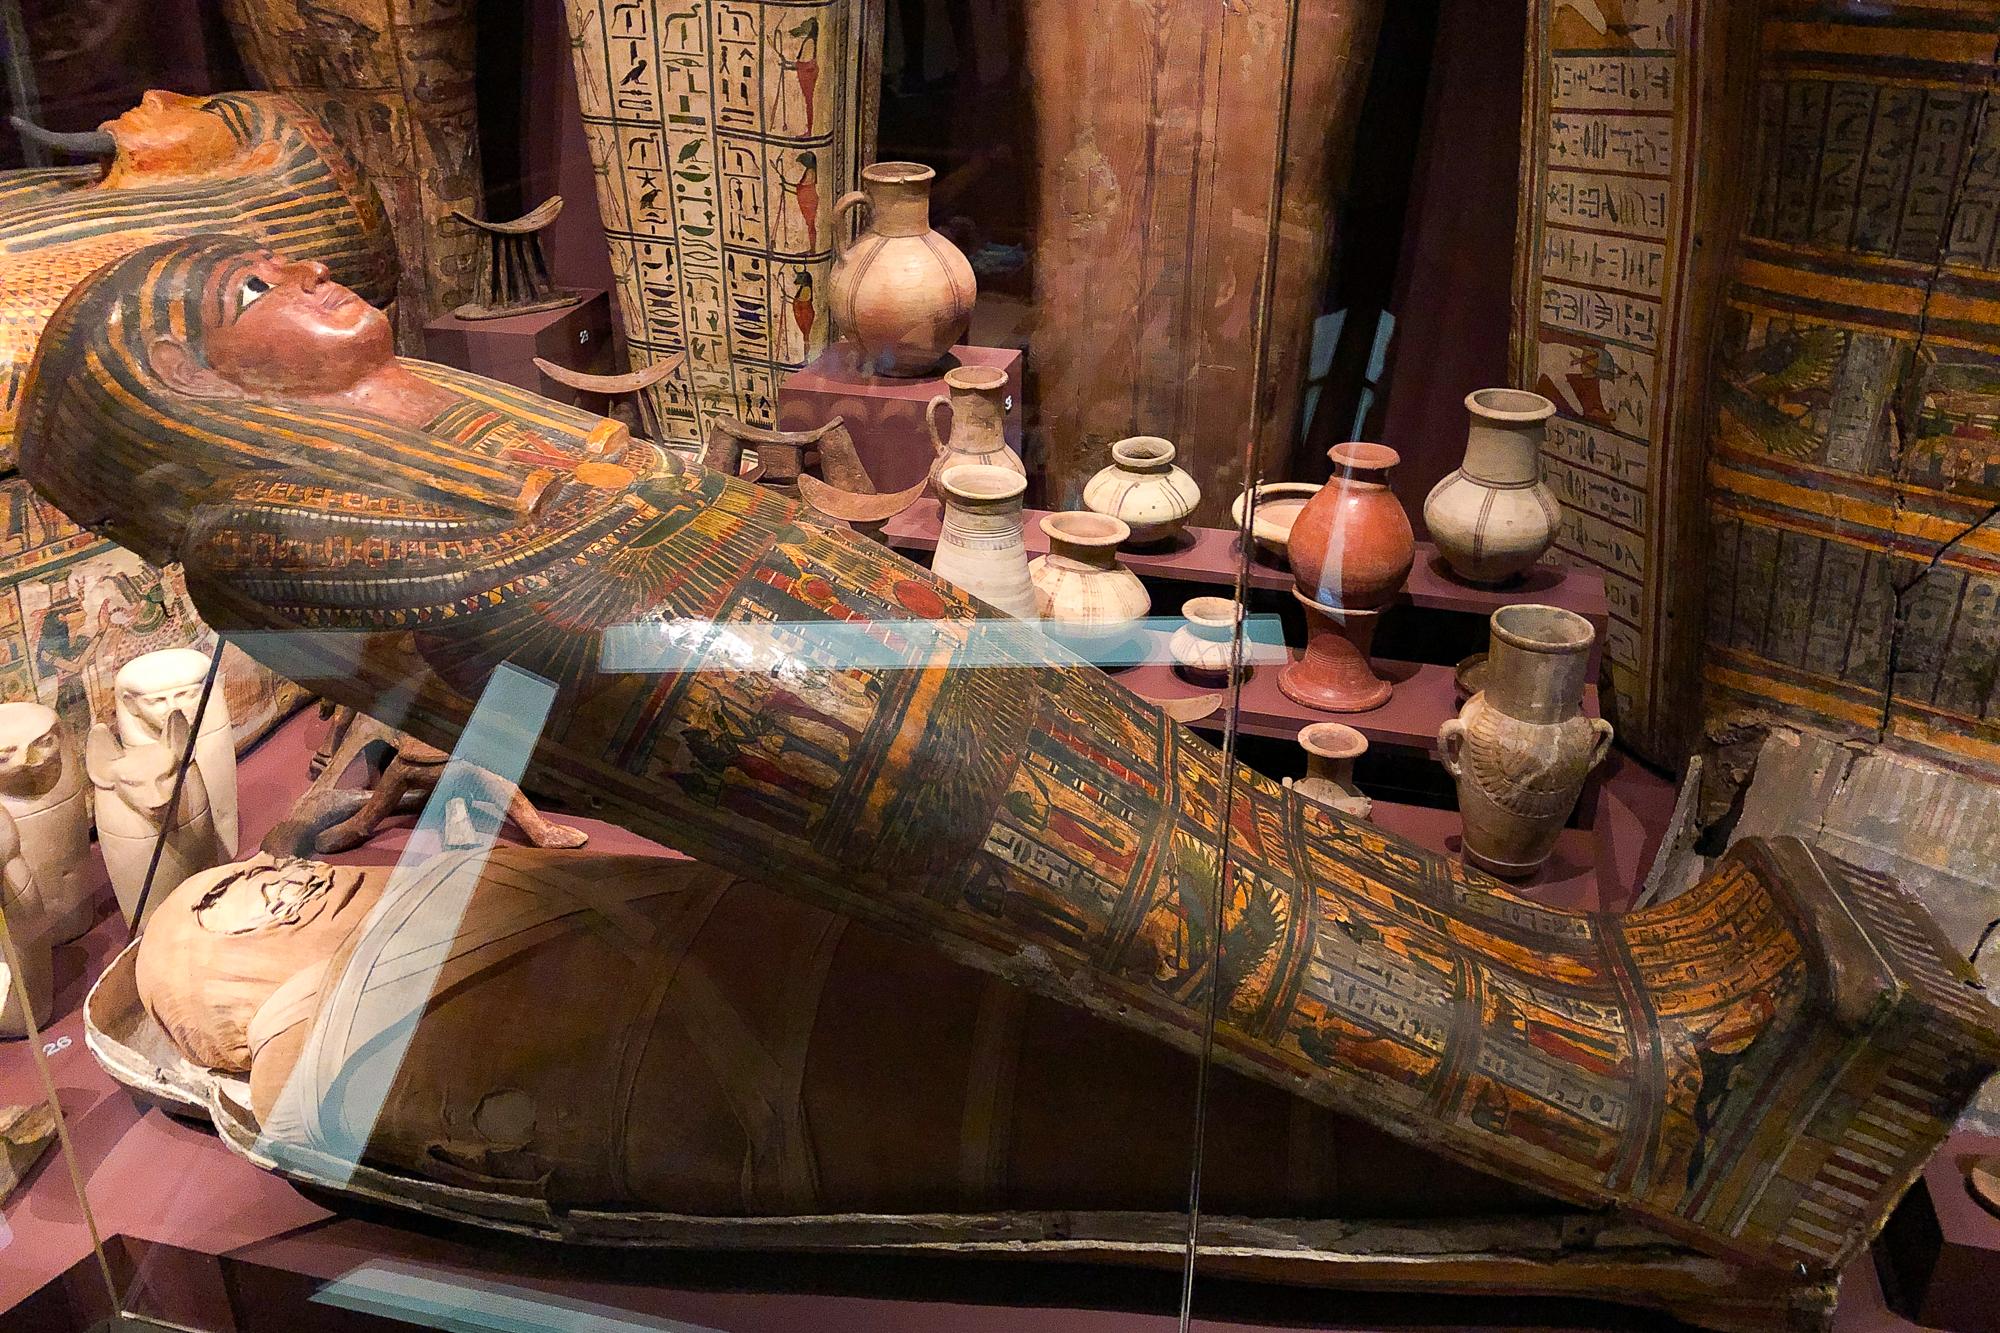 mumie i sarkofag på Medelhavsmuseet i Stockholm.